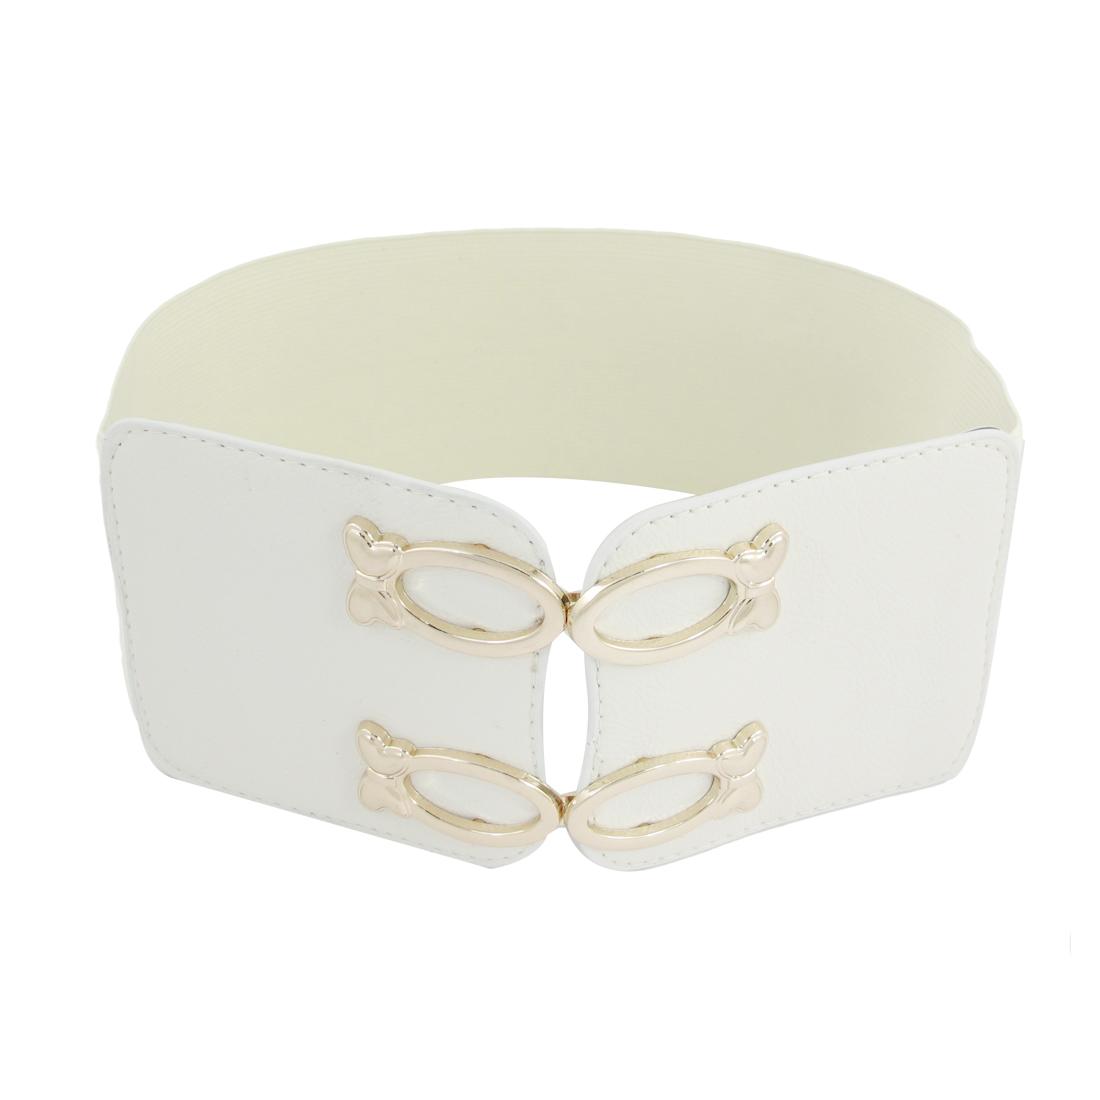 White Double Buckle Adornment Strechy Band Waist Belt Textured for Women